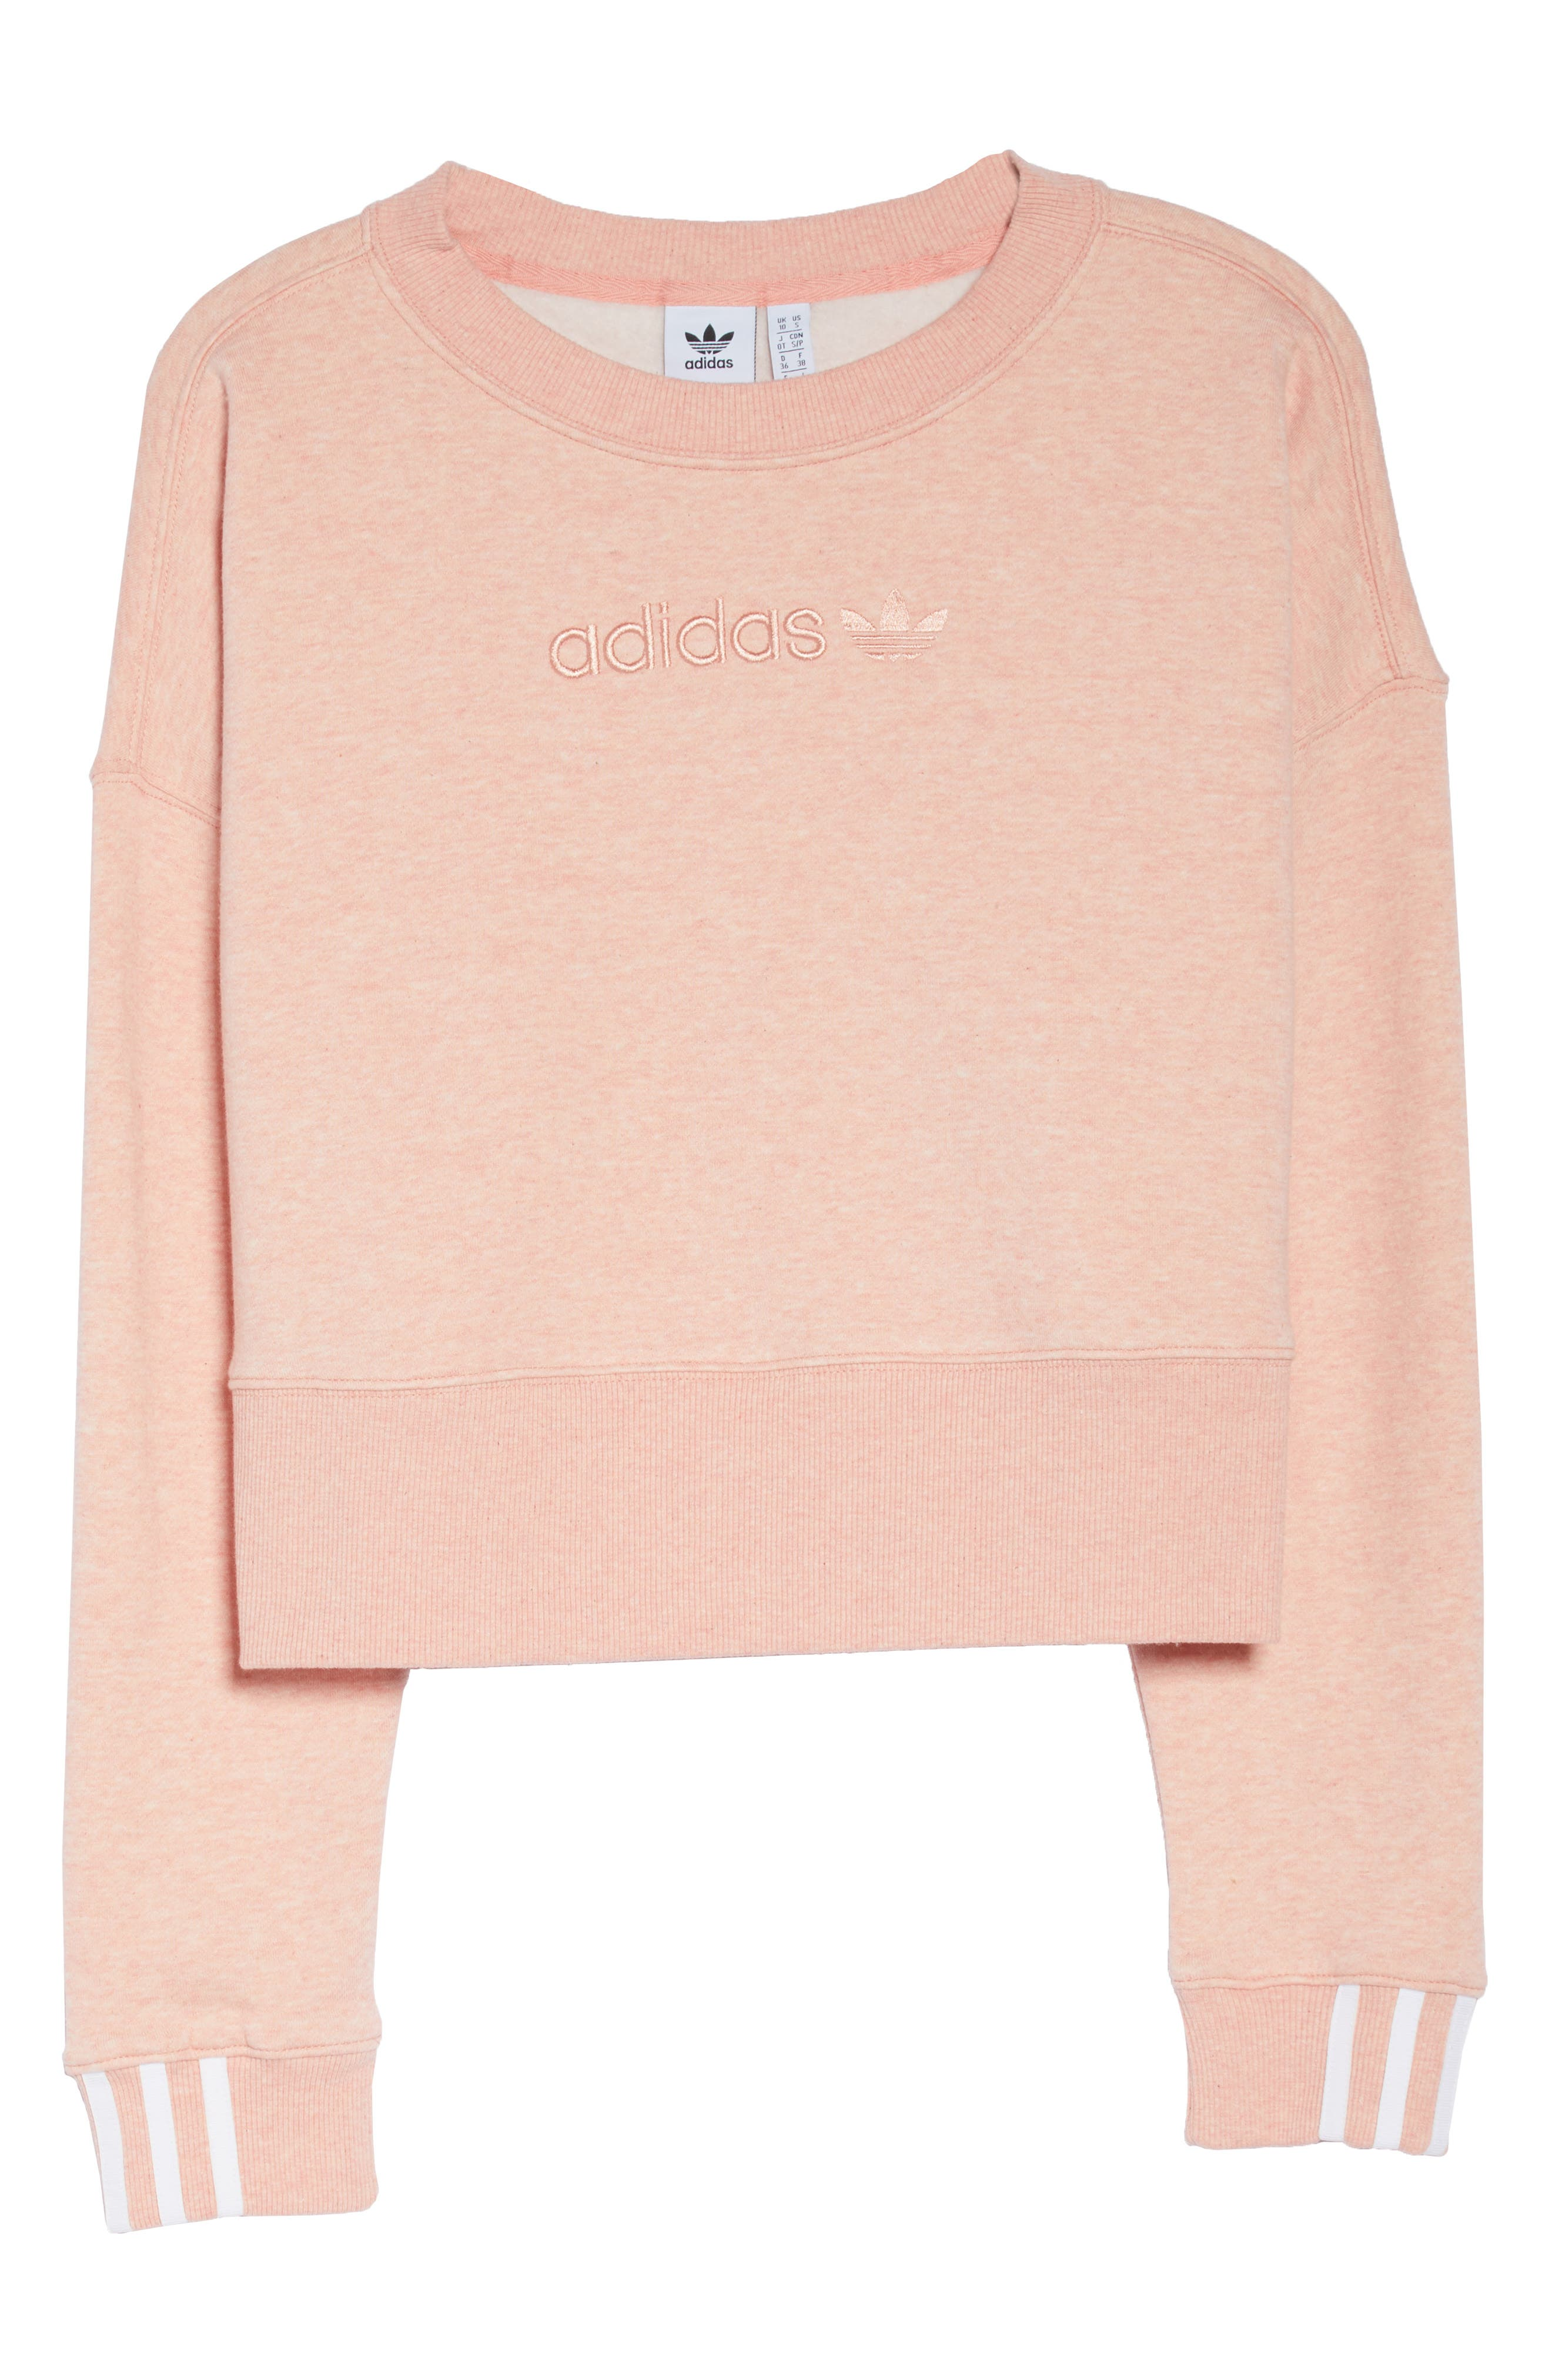 ADIDAS ORIGINALS, adidas Coeeze Crop Sweatshirt, Alternate thumbnail 7, color, 650